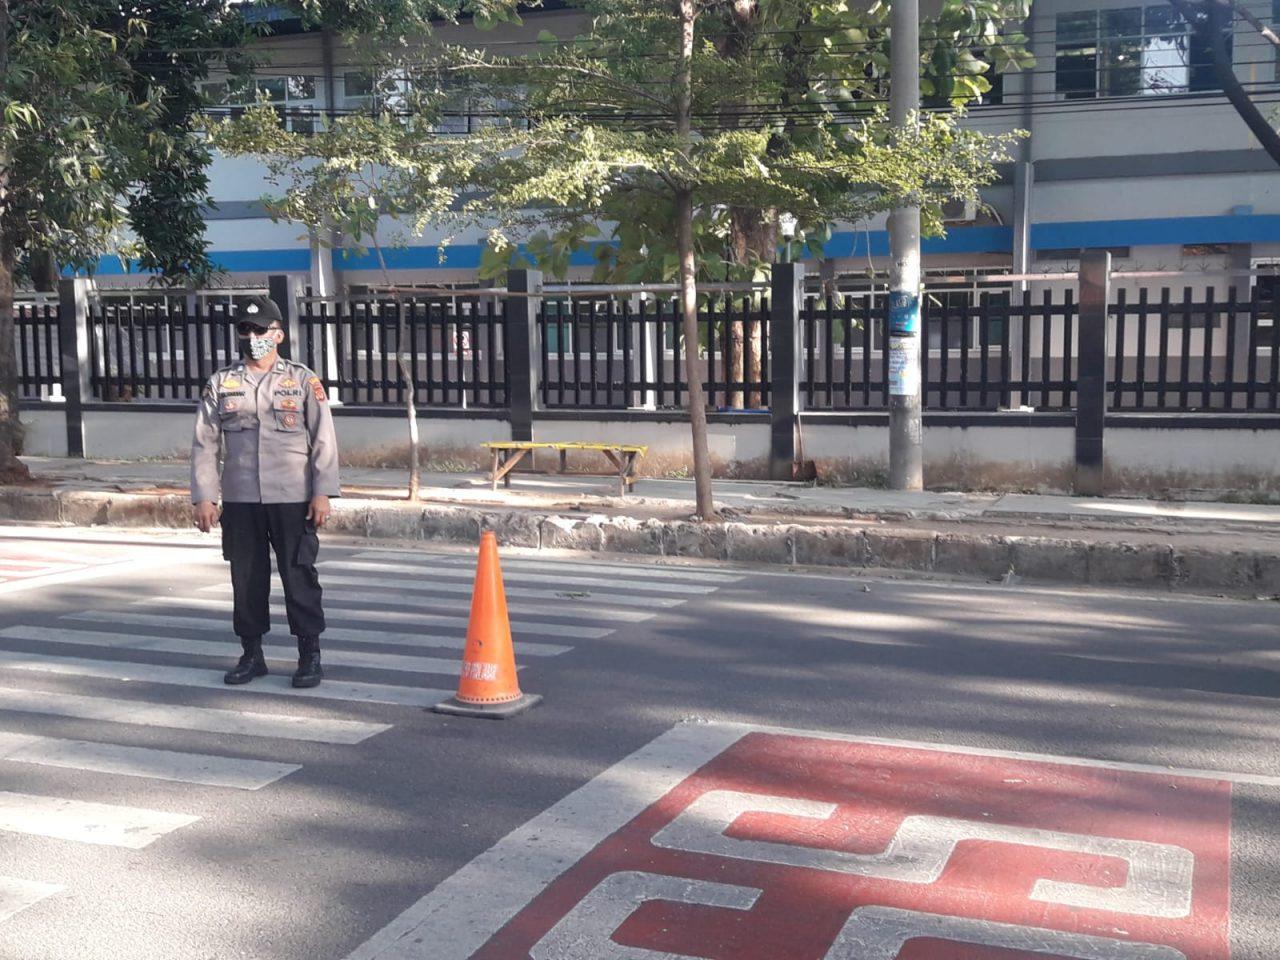 Polsek Kesambi Polres Ciko Terapkan Prokes 5 M Bagi Pengendara Saat Gatur Pagi Hari